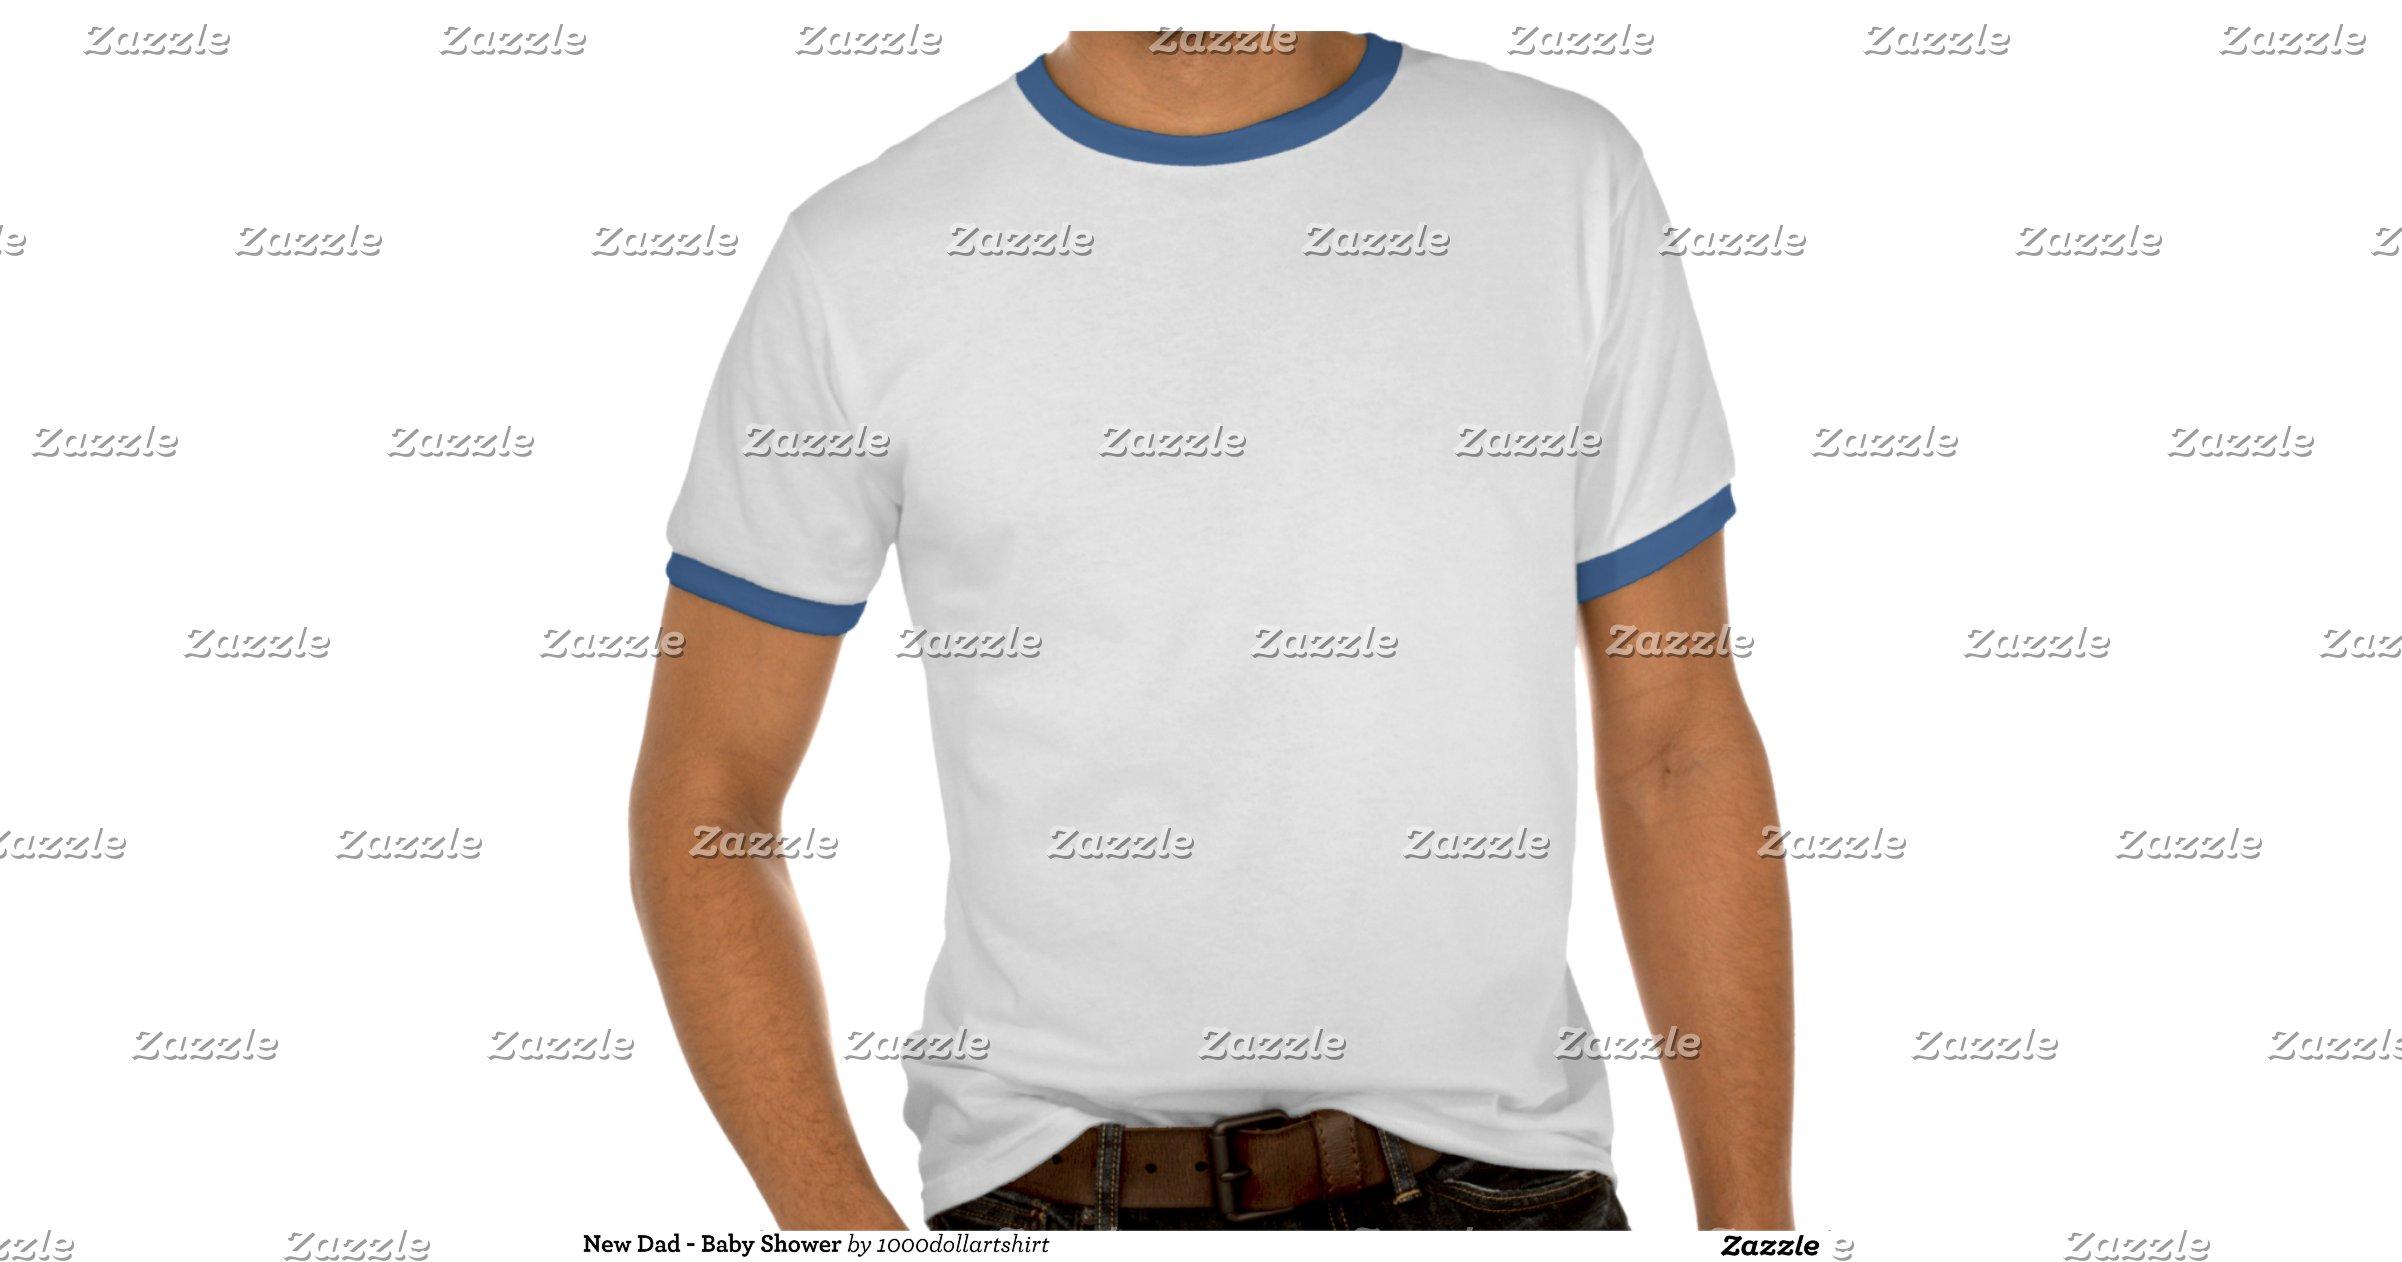 new dad baby shower tee shirt r70bef5f9fc8745efa6130f3f1287d8c5 vj7q2